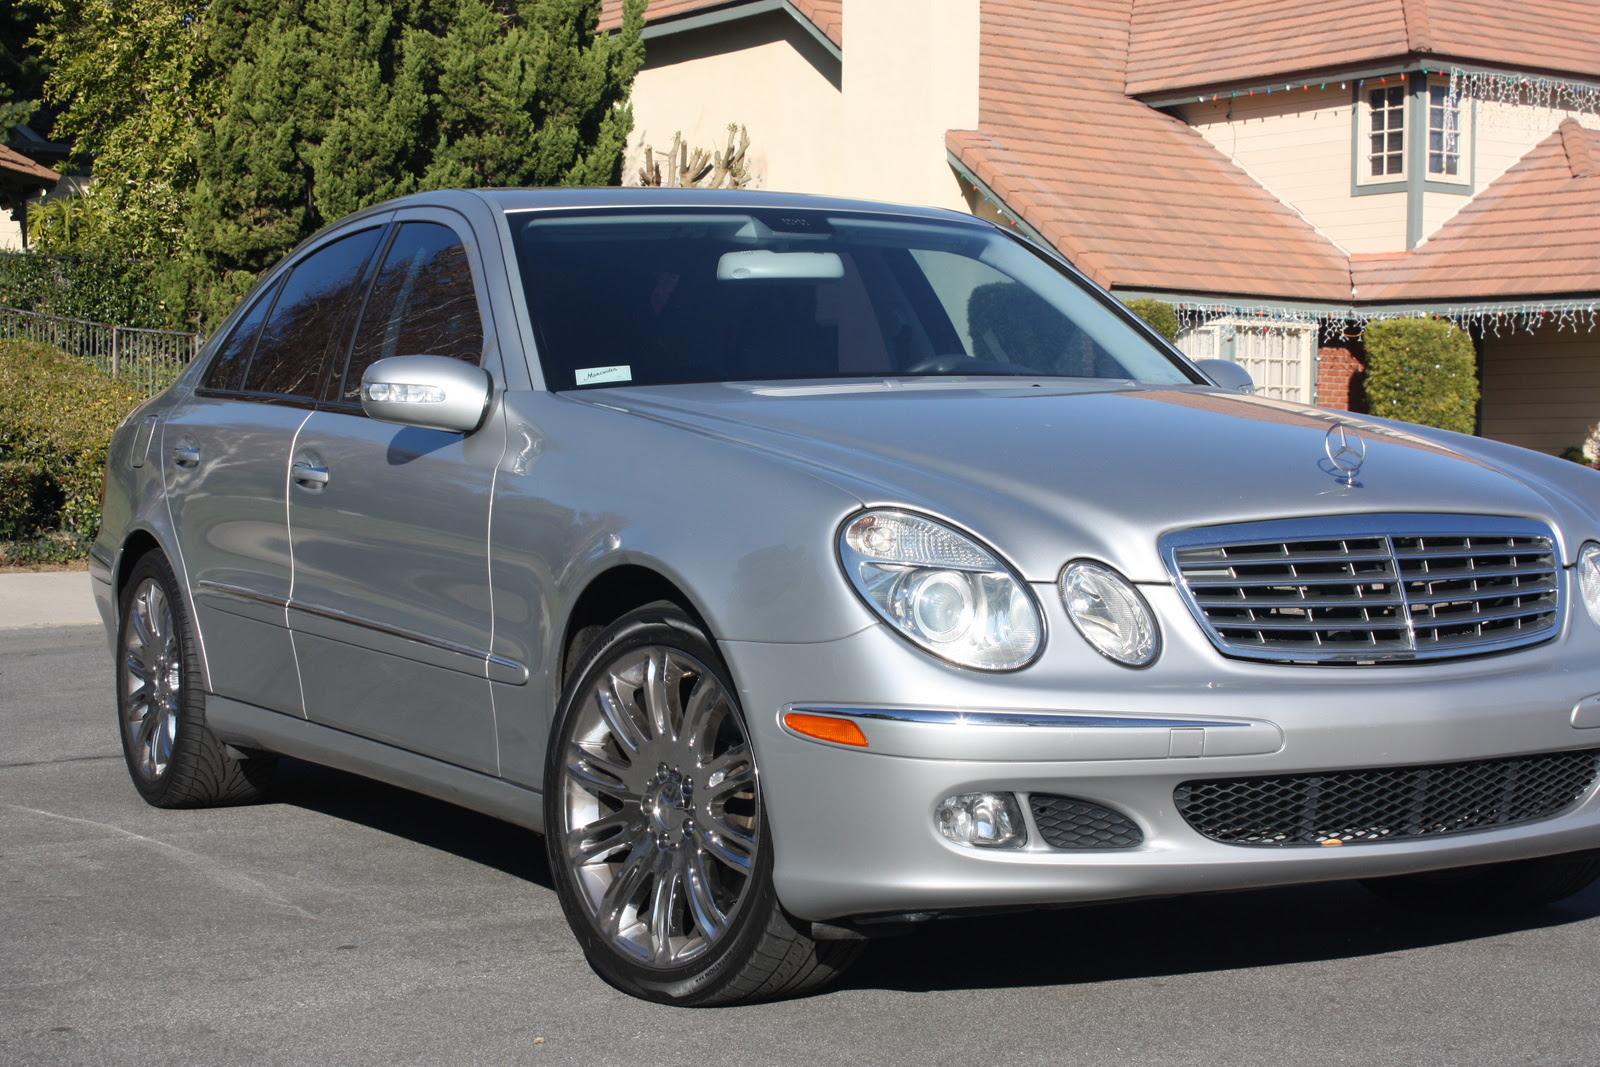 2006 Mercedes-Benz E-Class - Pictures - CarGurus